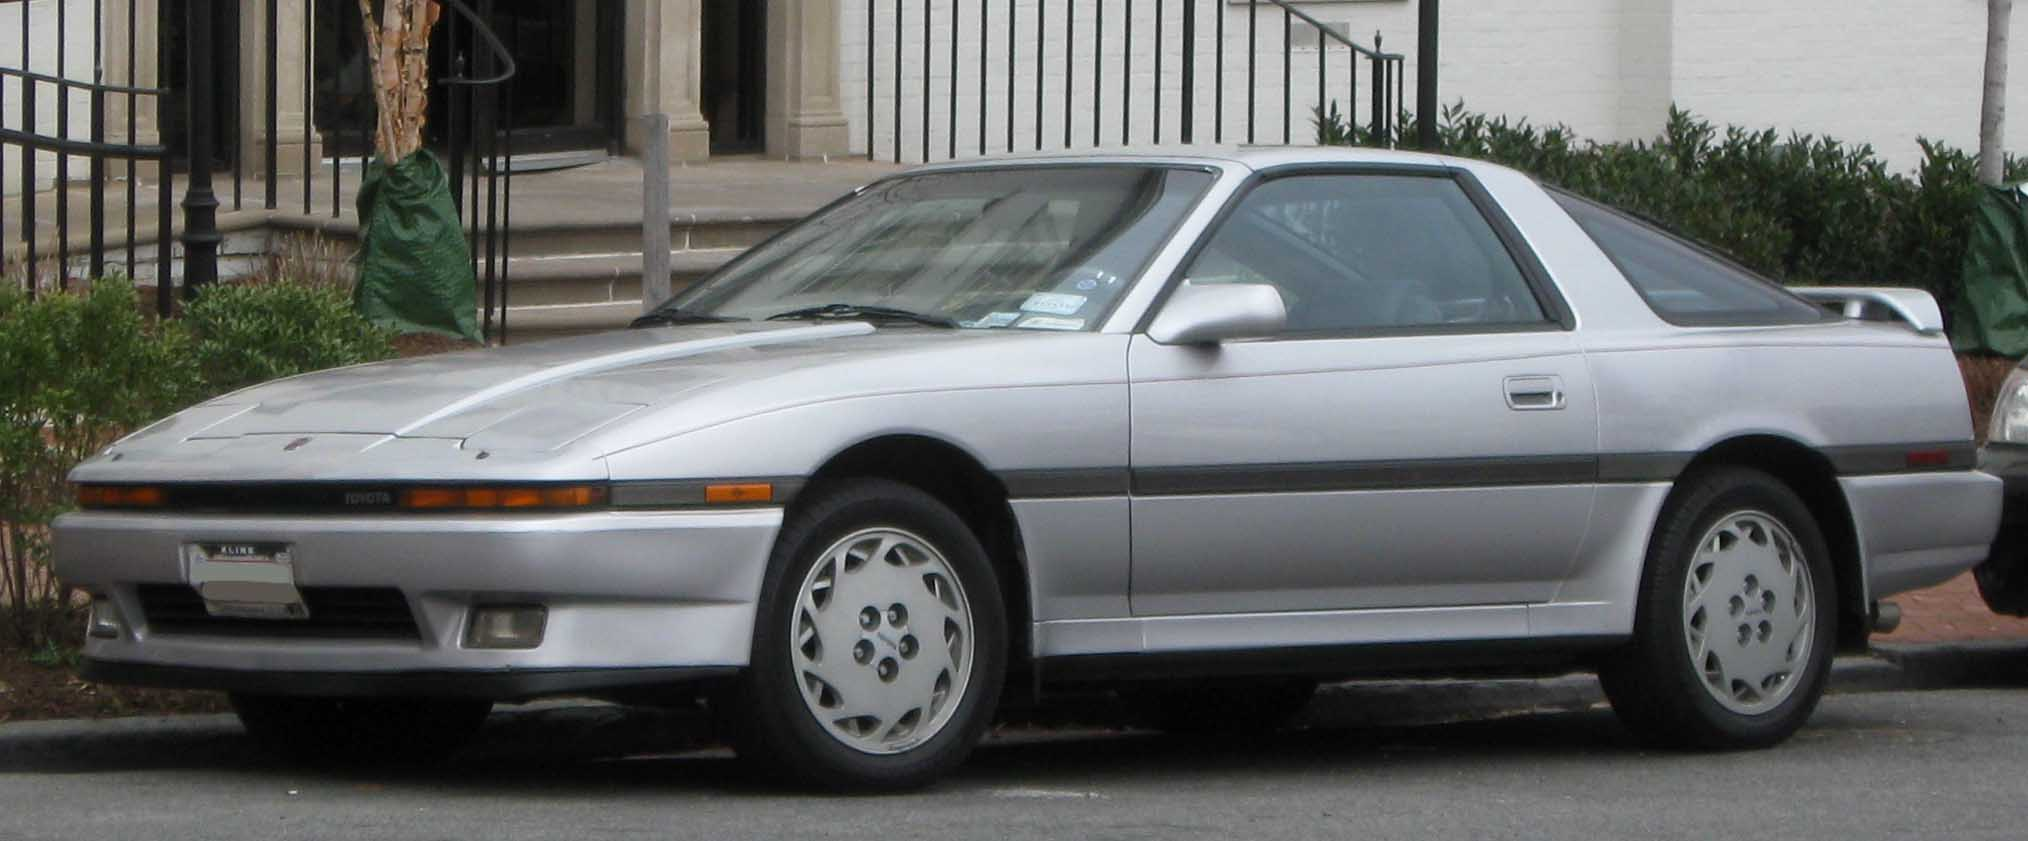 Toyota Supra III (A70) 1986 - 1993 Coupe #6